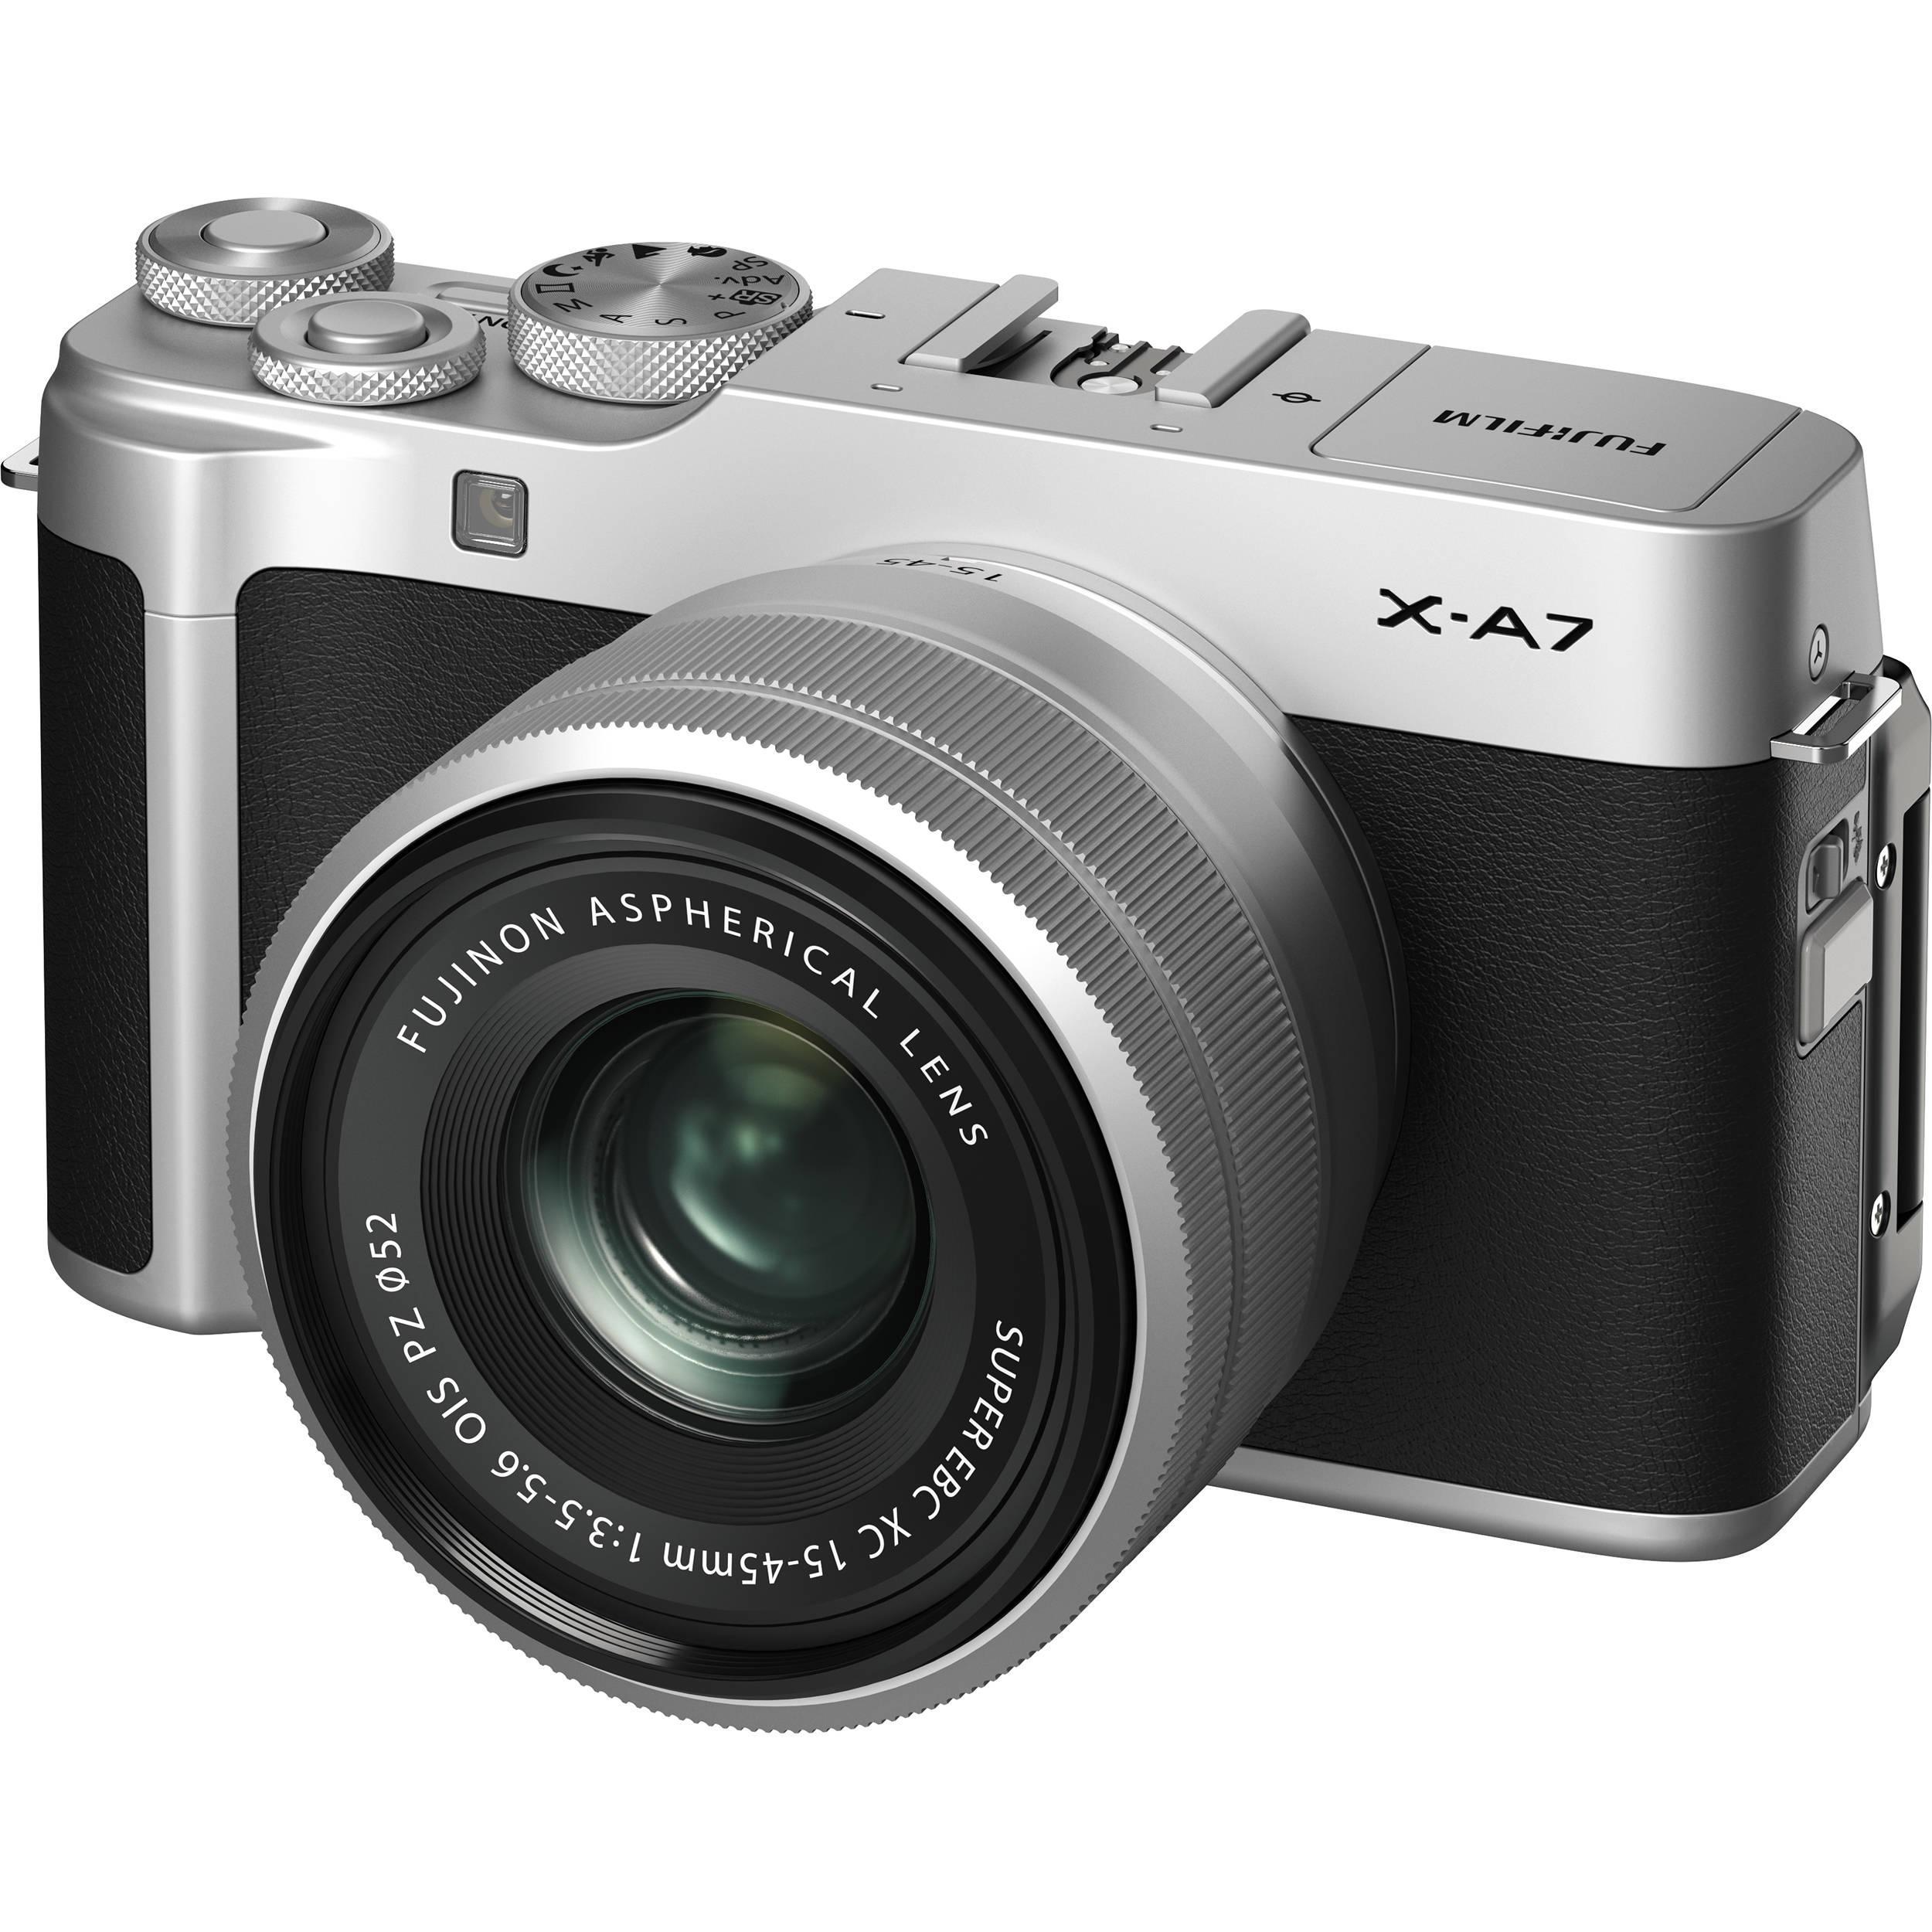 Fujifilm X-A7 Mirrorless Digital Camera with 15-45mm Lens (Silver)